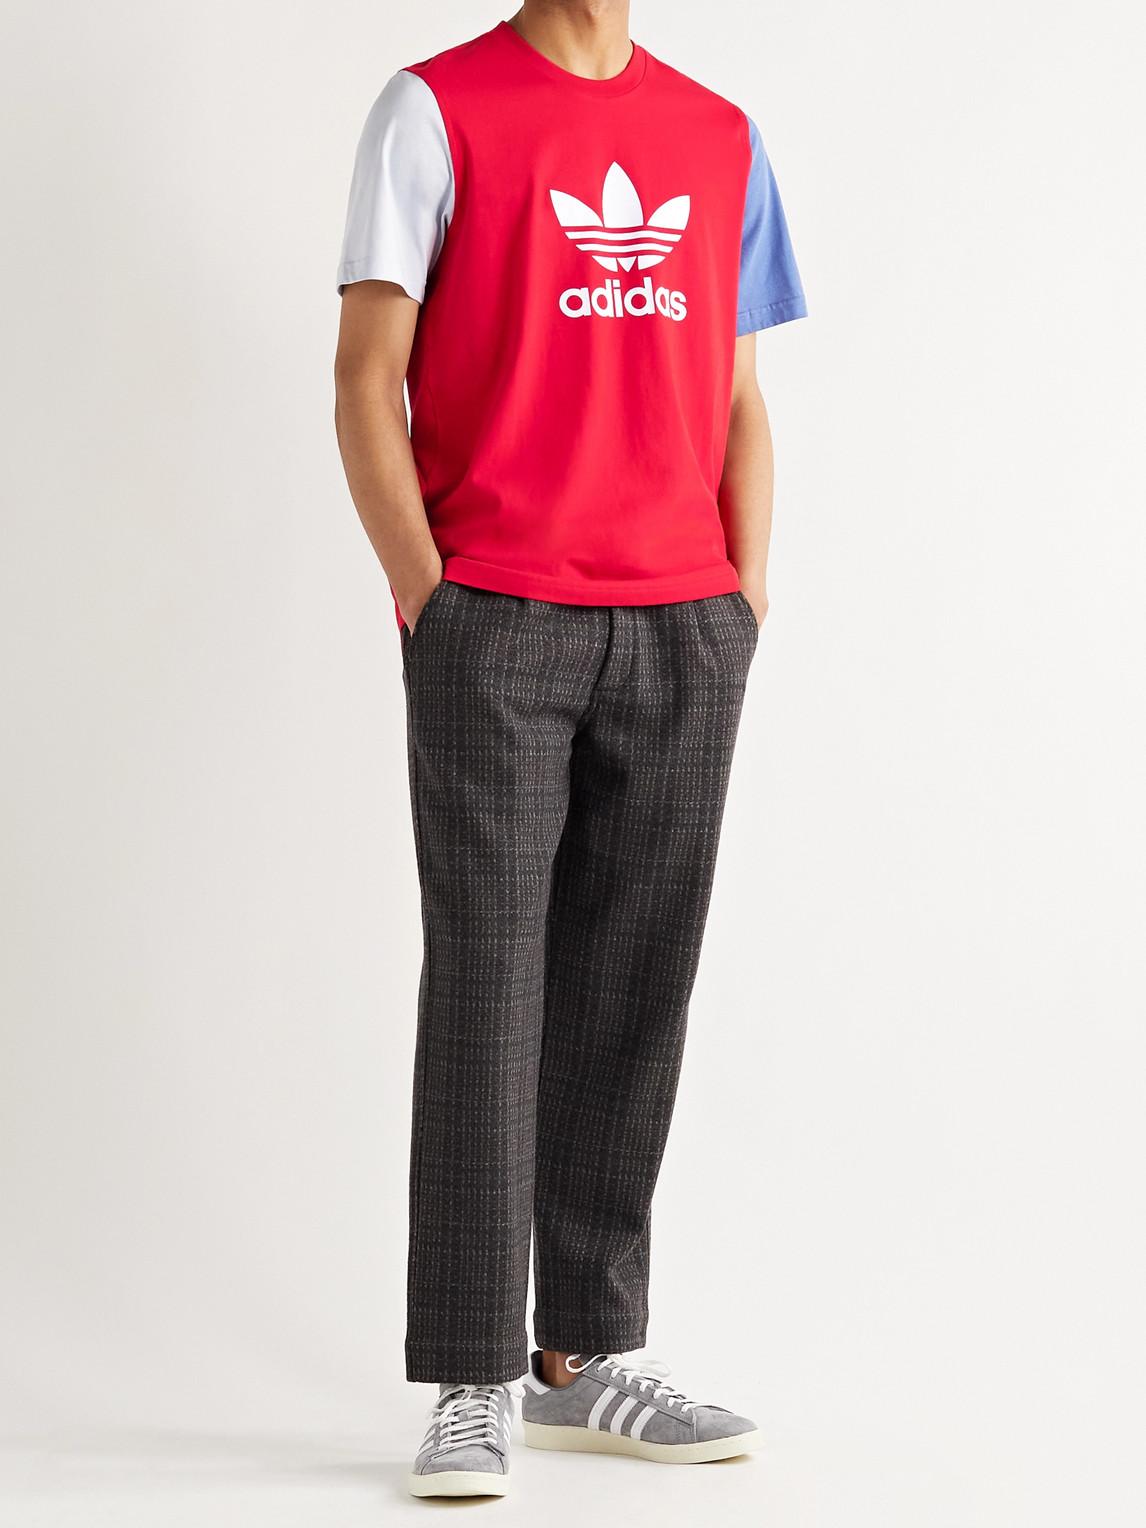 ADIDAS ORIGINALS T-shirts COLOR-BLOCK LOGO-PRINT COTTON-JERSEY T-SHIRT